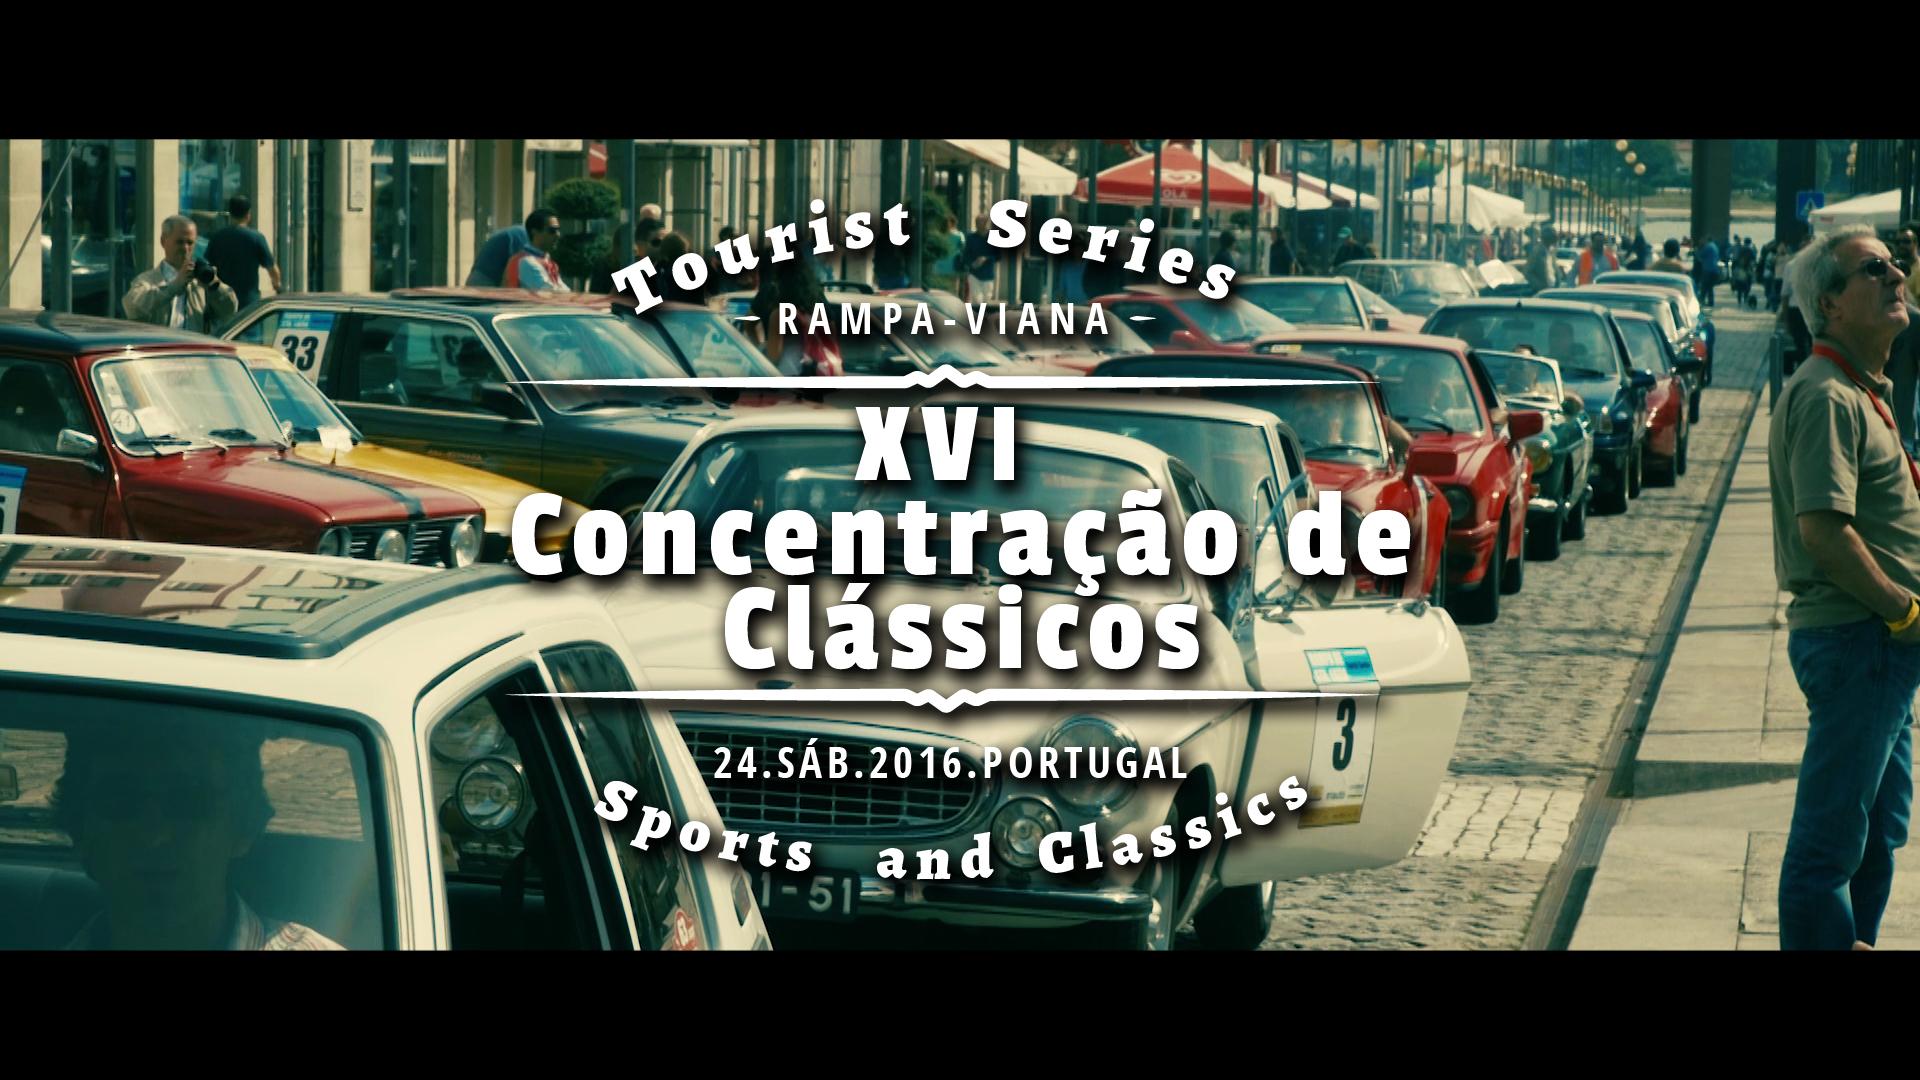 07_thumbnail_XVI_Concentracao_classicos_2016.jpg